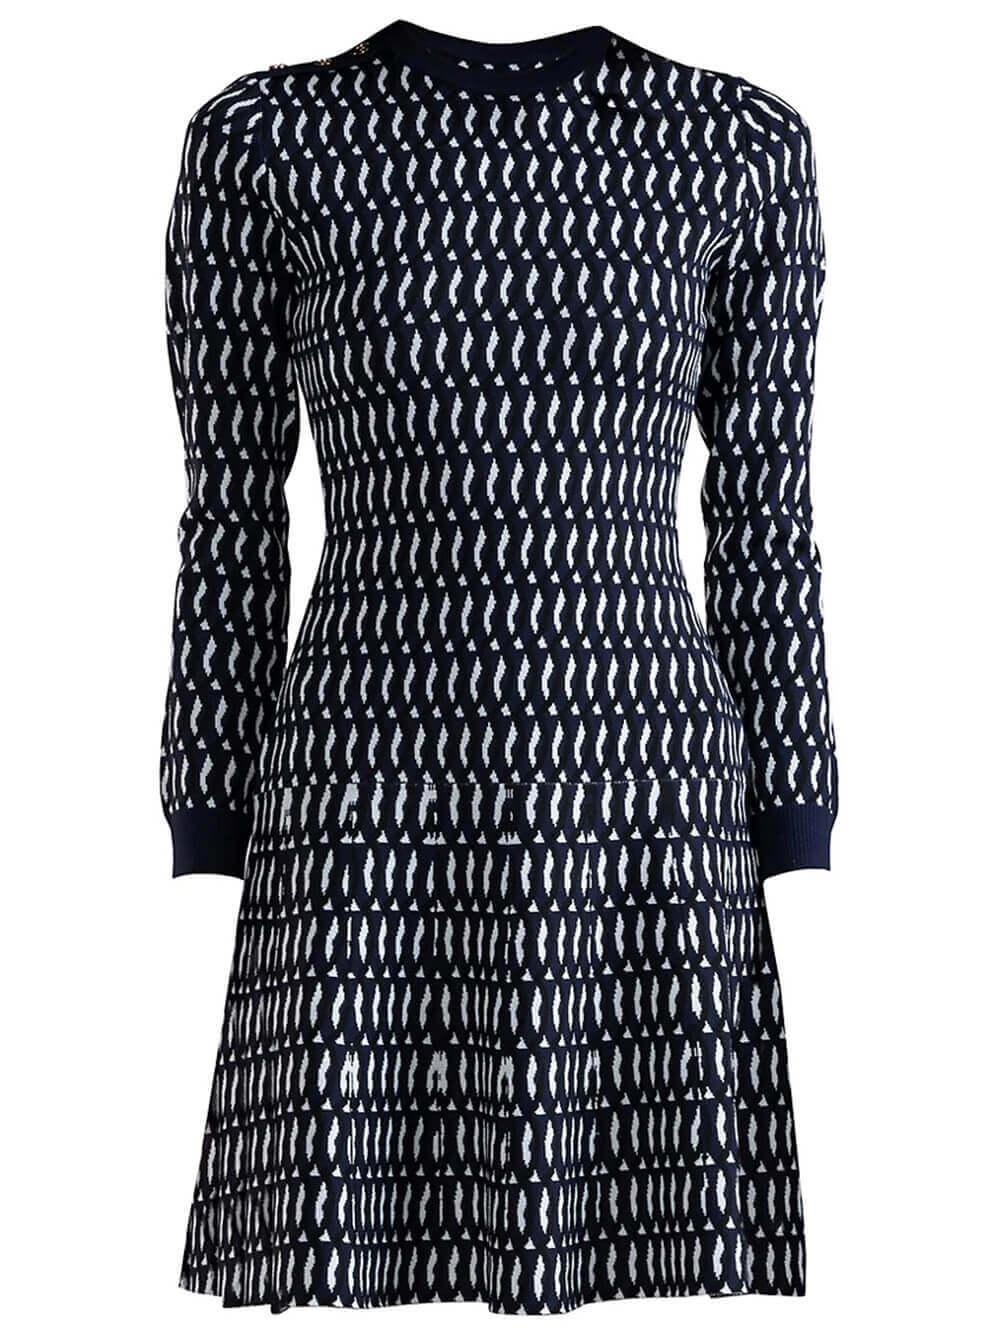 Aspen Dress Item # 6204434